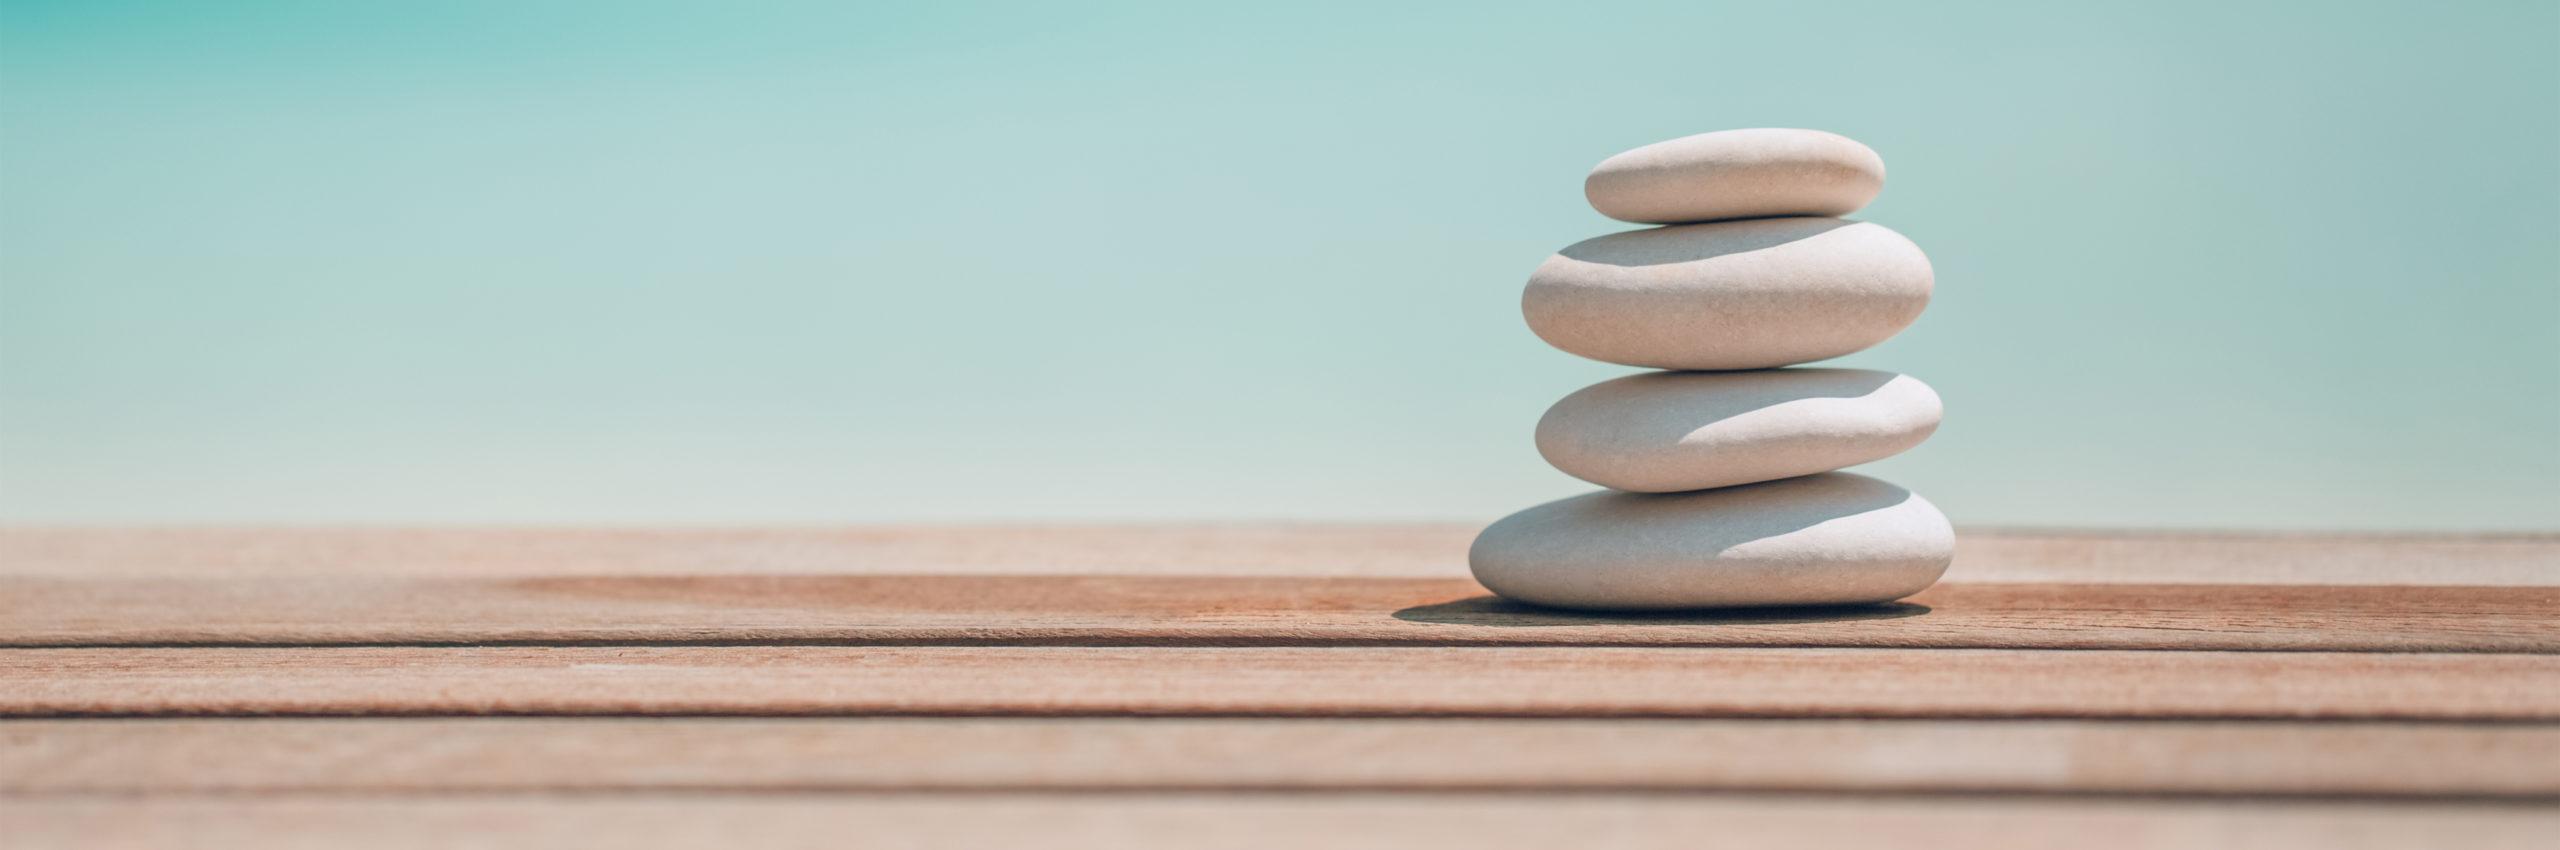 Präventionskurse Yoga Coaching Brehna Momentum Werner Ulrike Werner Thomas Werner